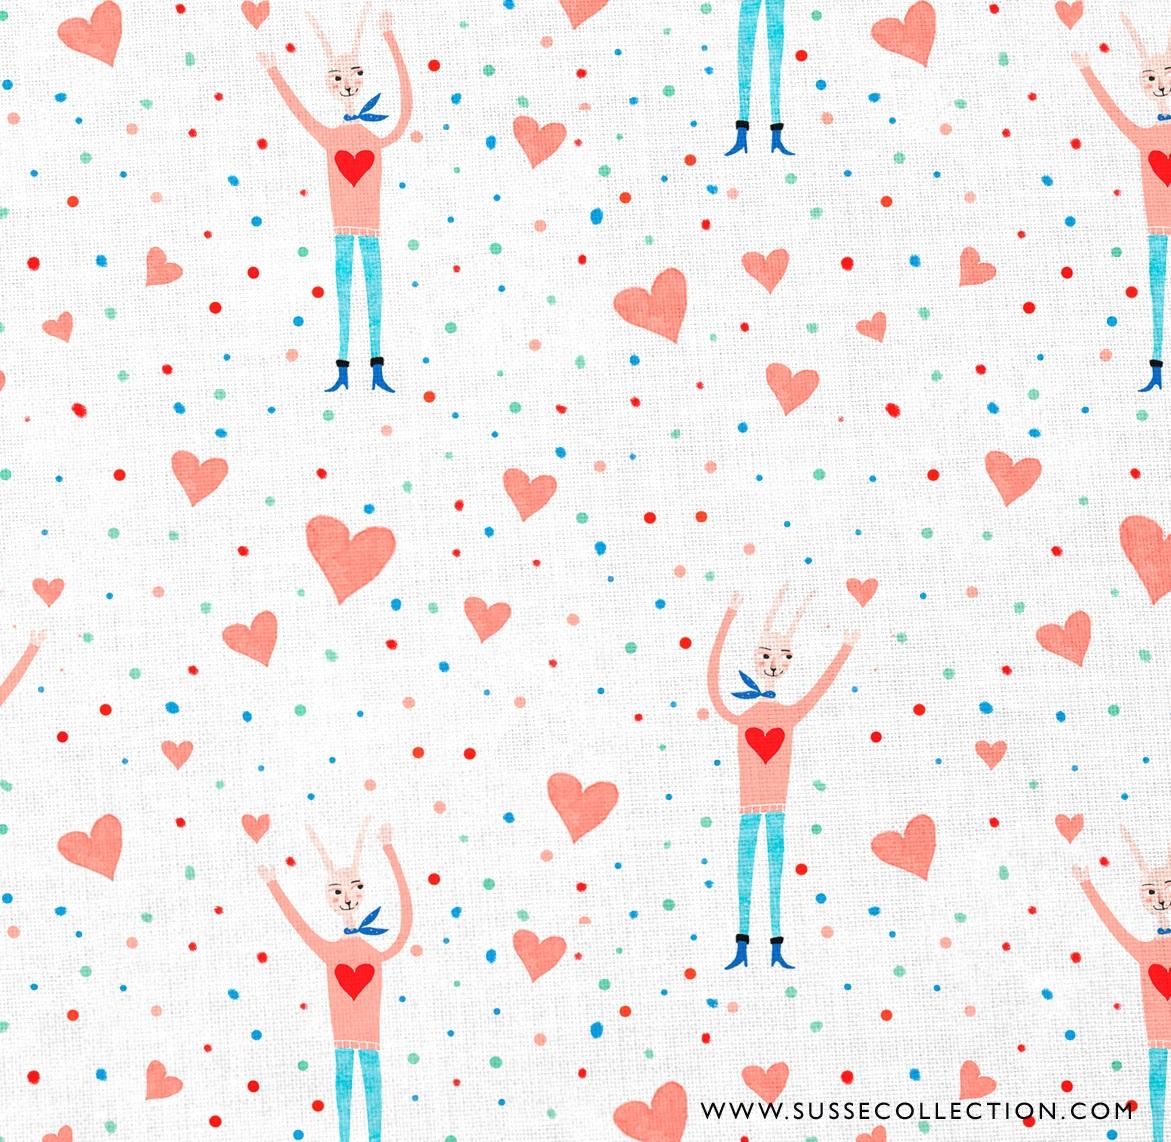 Valentines+day+pattern+2+.jpg